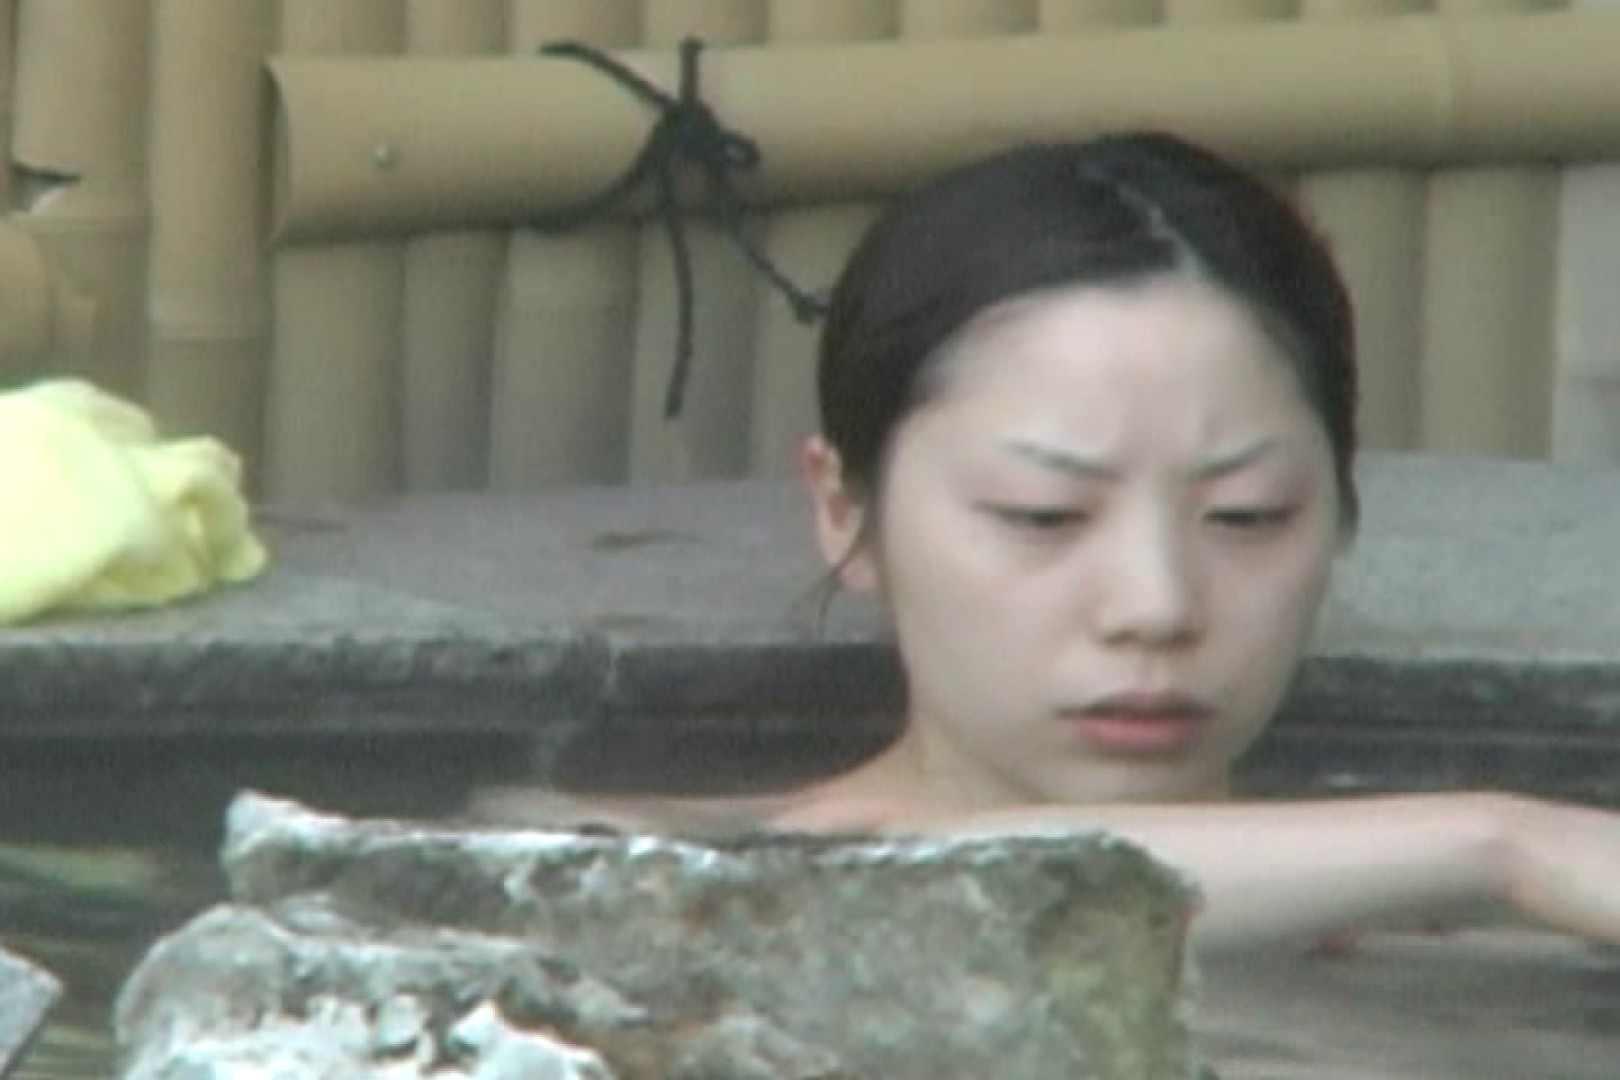 Aquaな露天風呂Vol.596 OLセックス | 盗撮  77画像 25